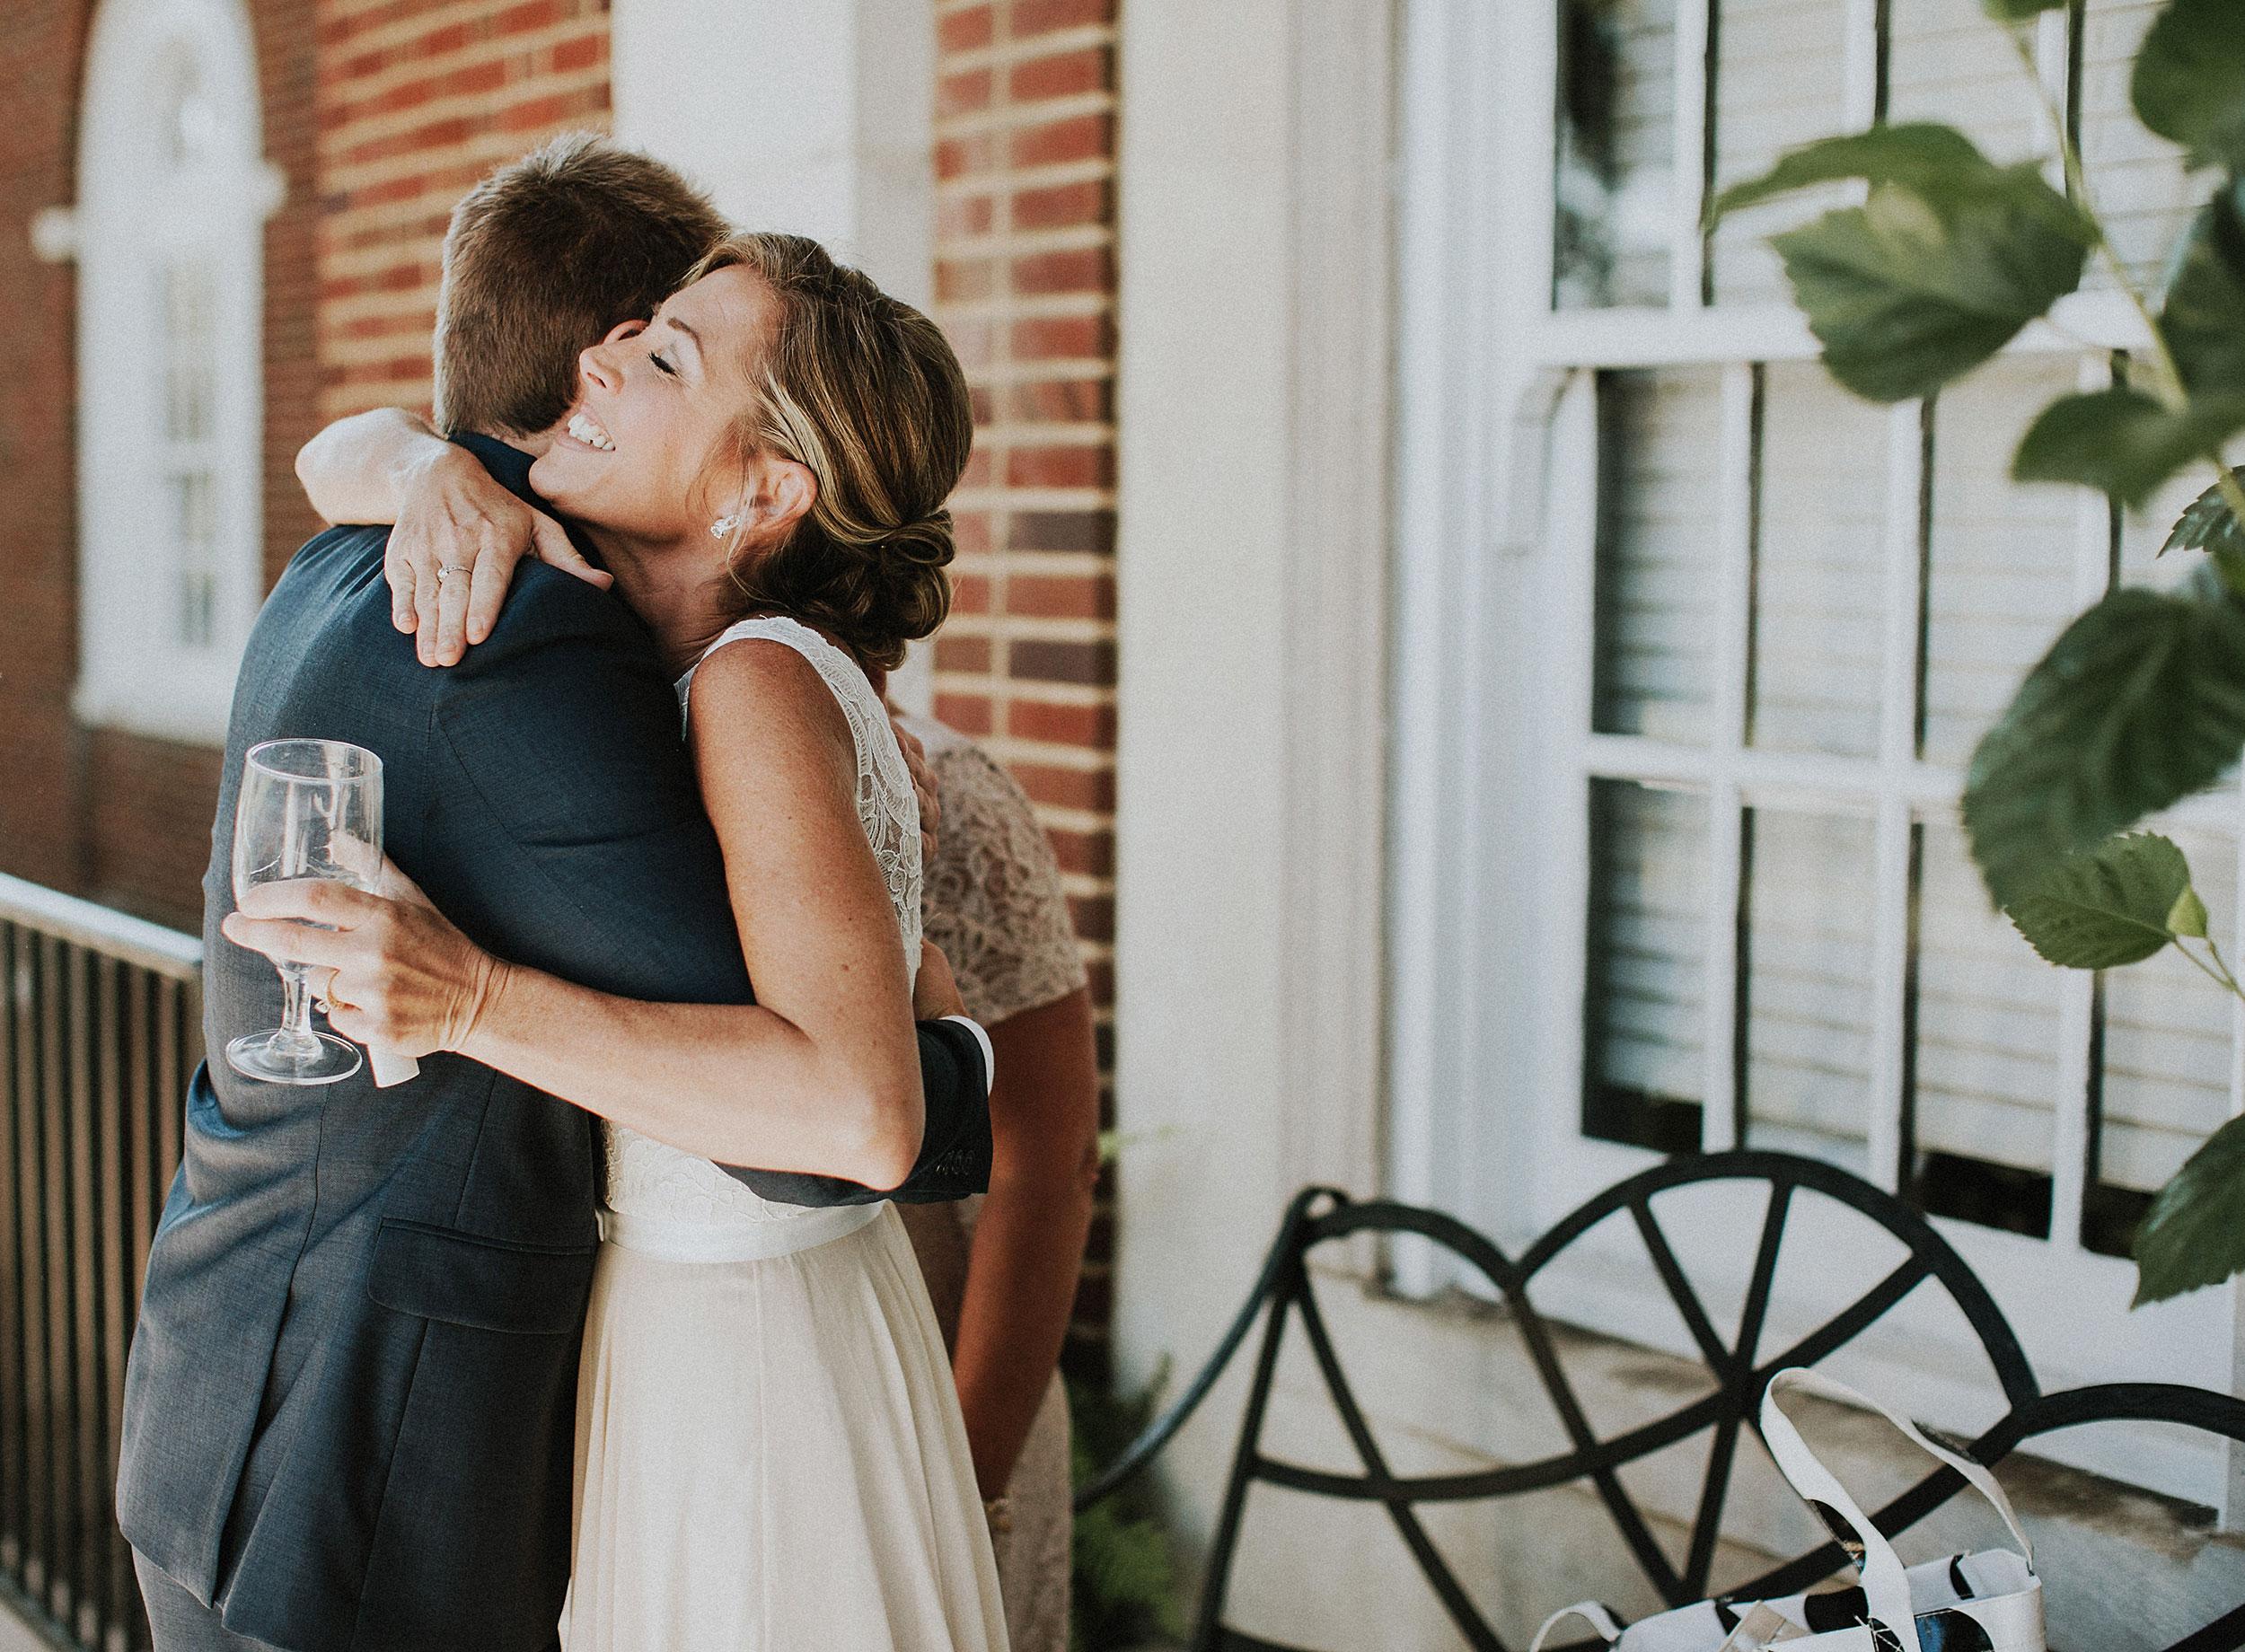 olmsted-wedding-louisville-kentucky-019.JPG